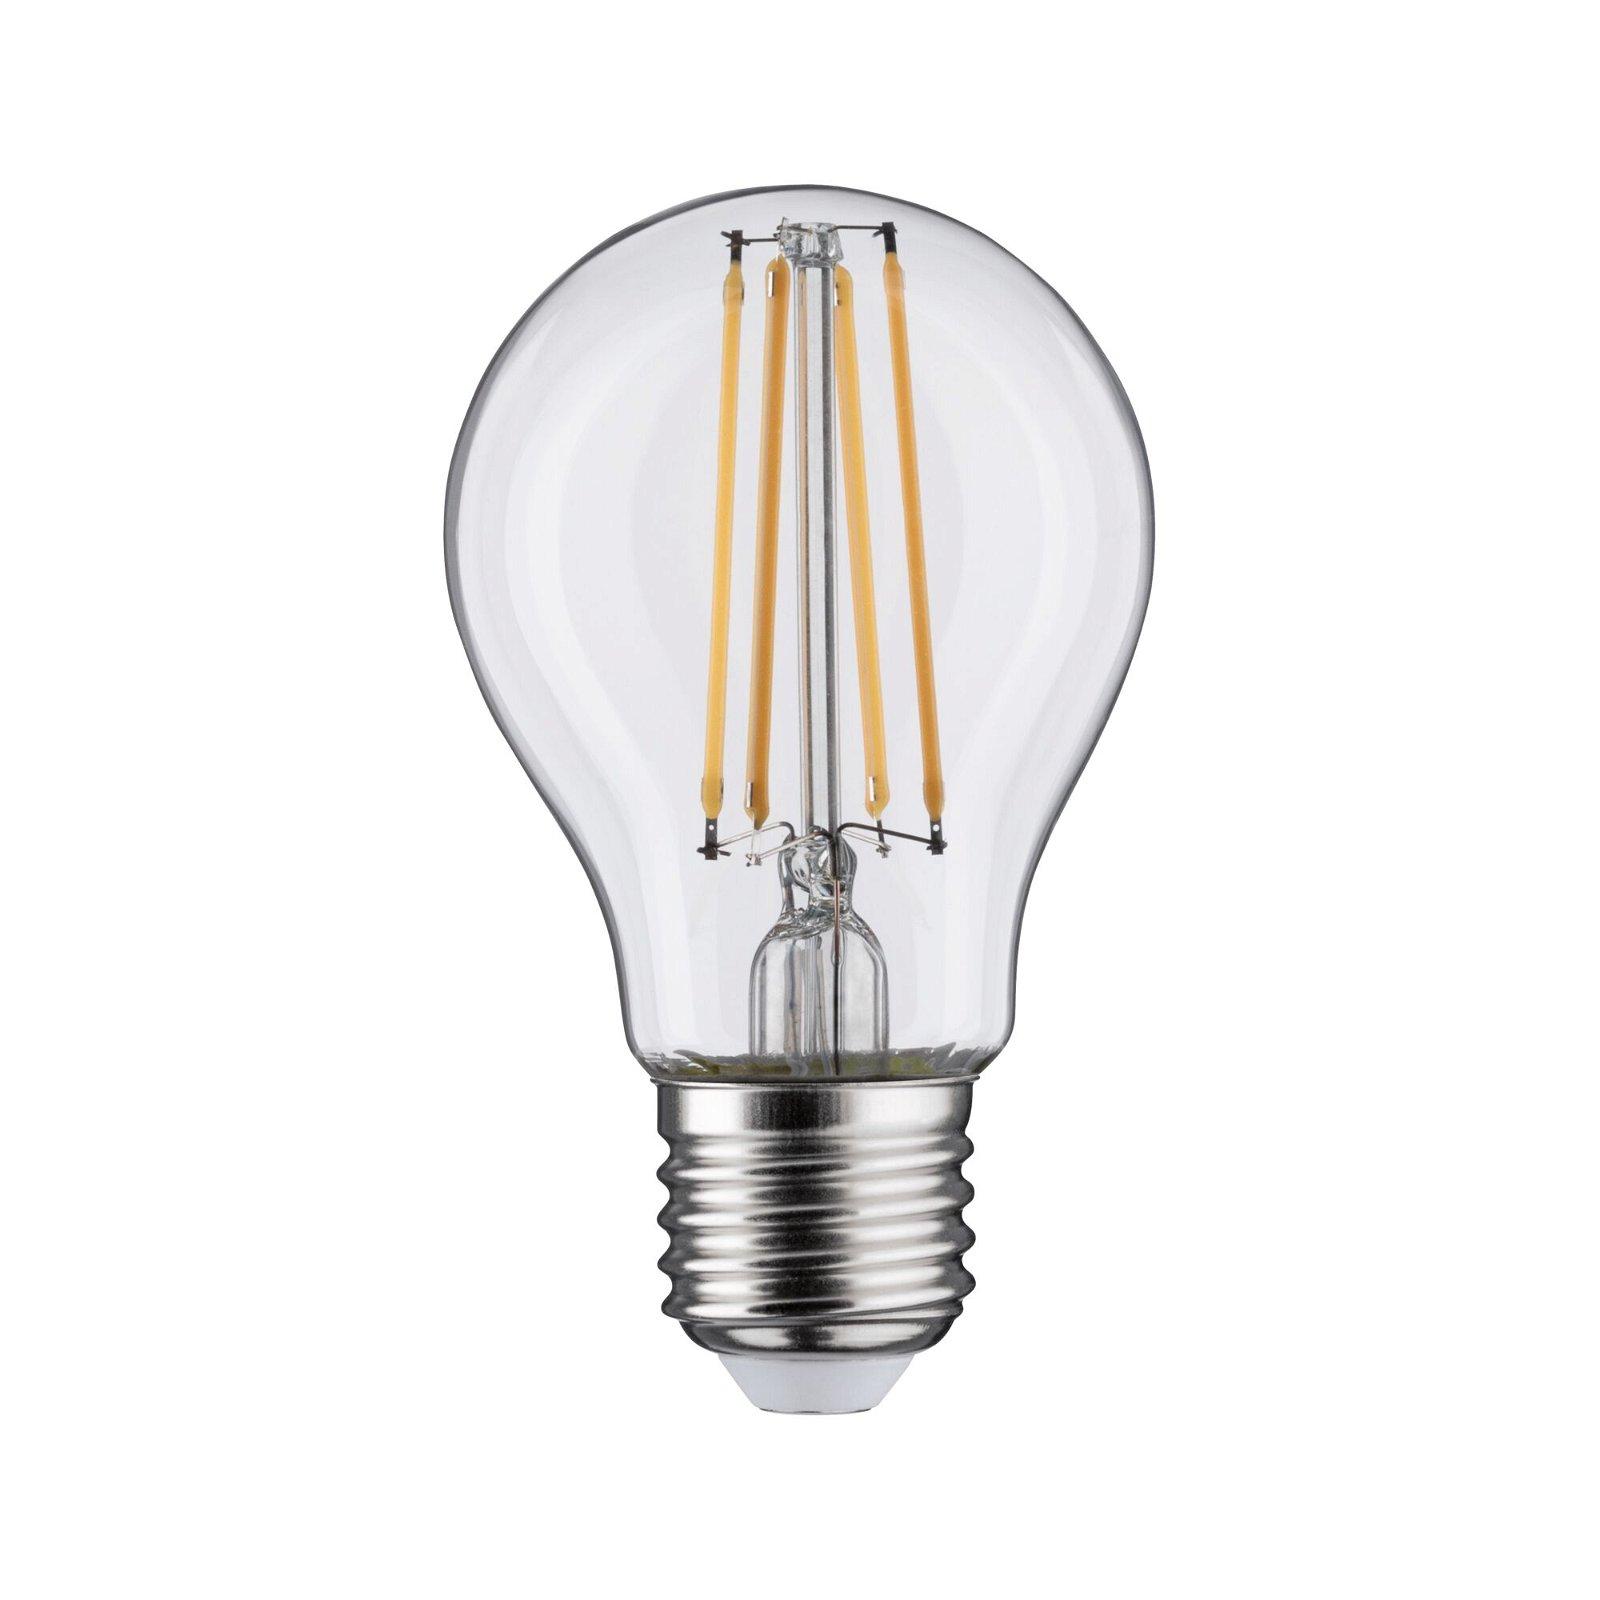 LED-gloeilamp Filament E27 230V 806lm 7W 2700K Helder